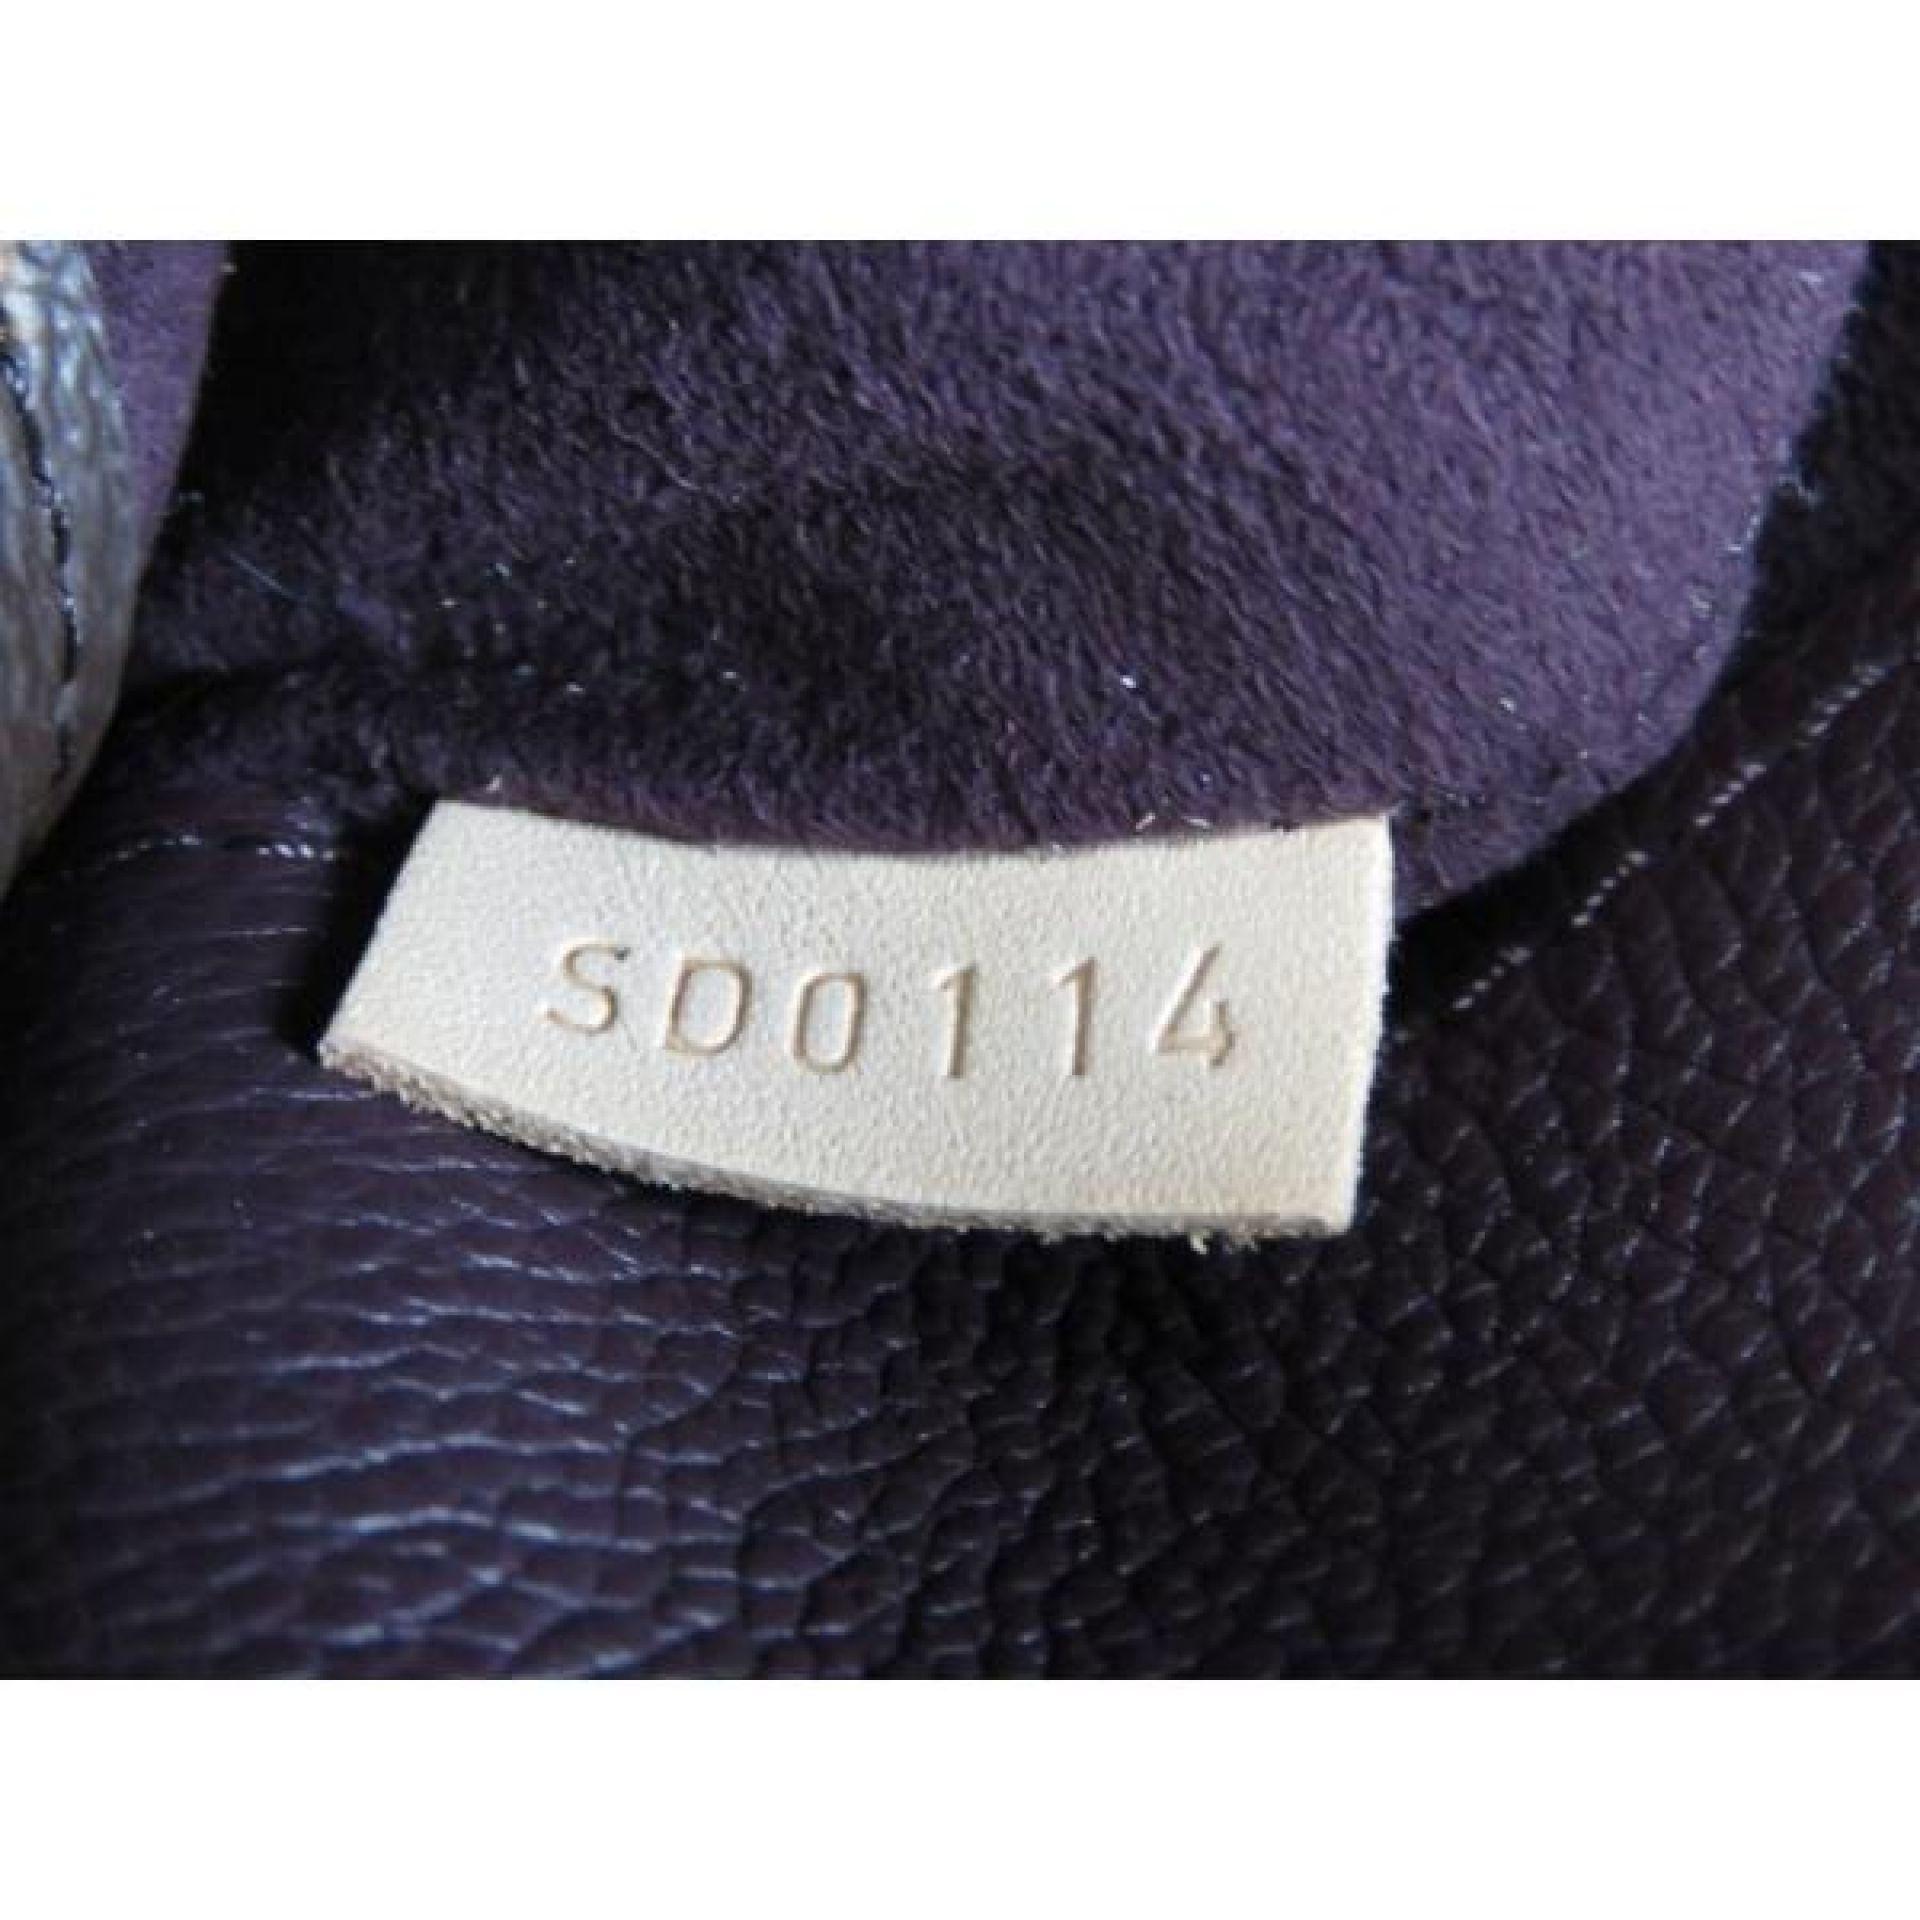 Louis Vuitton Dark Purple Monogram Canvas Pallas Satchel Bag